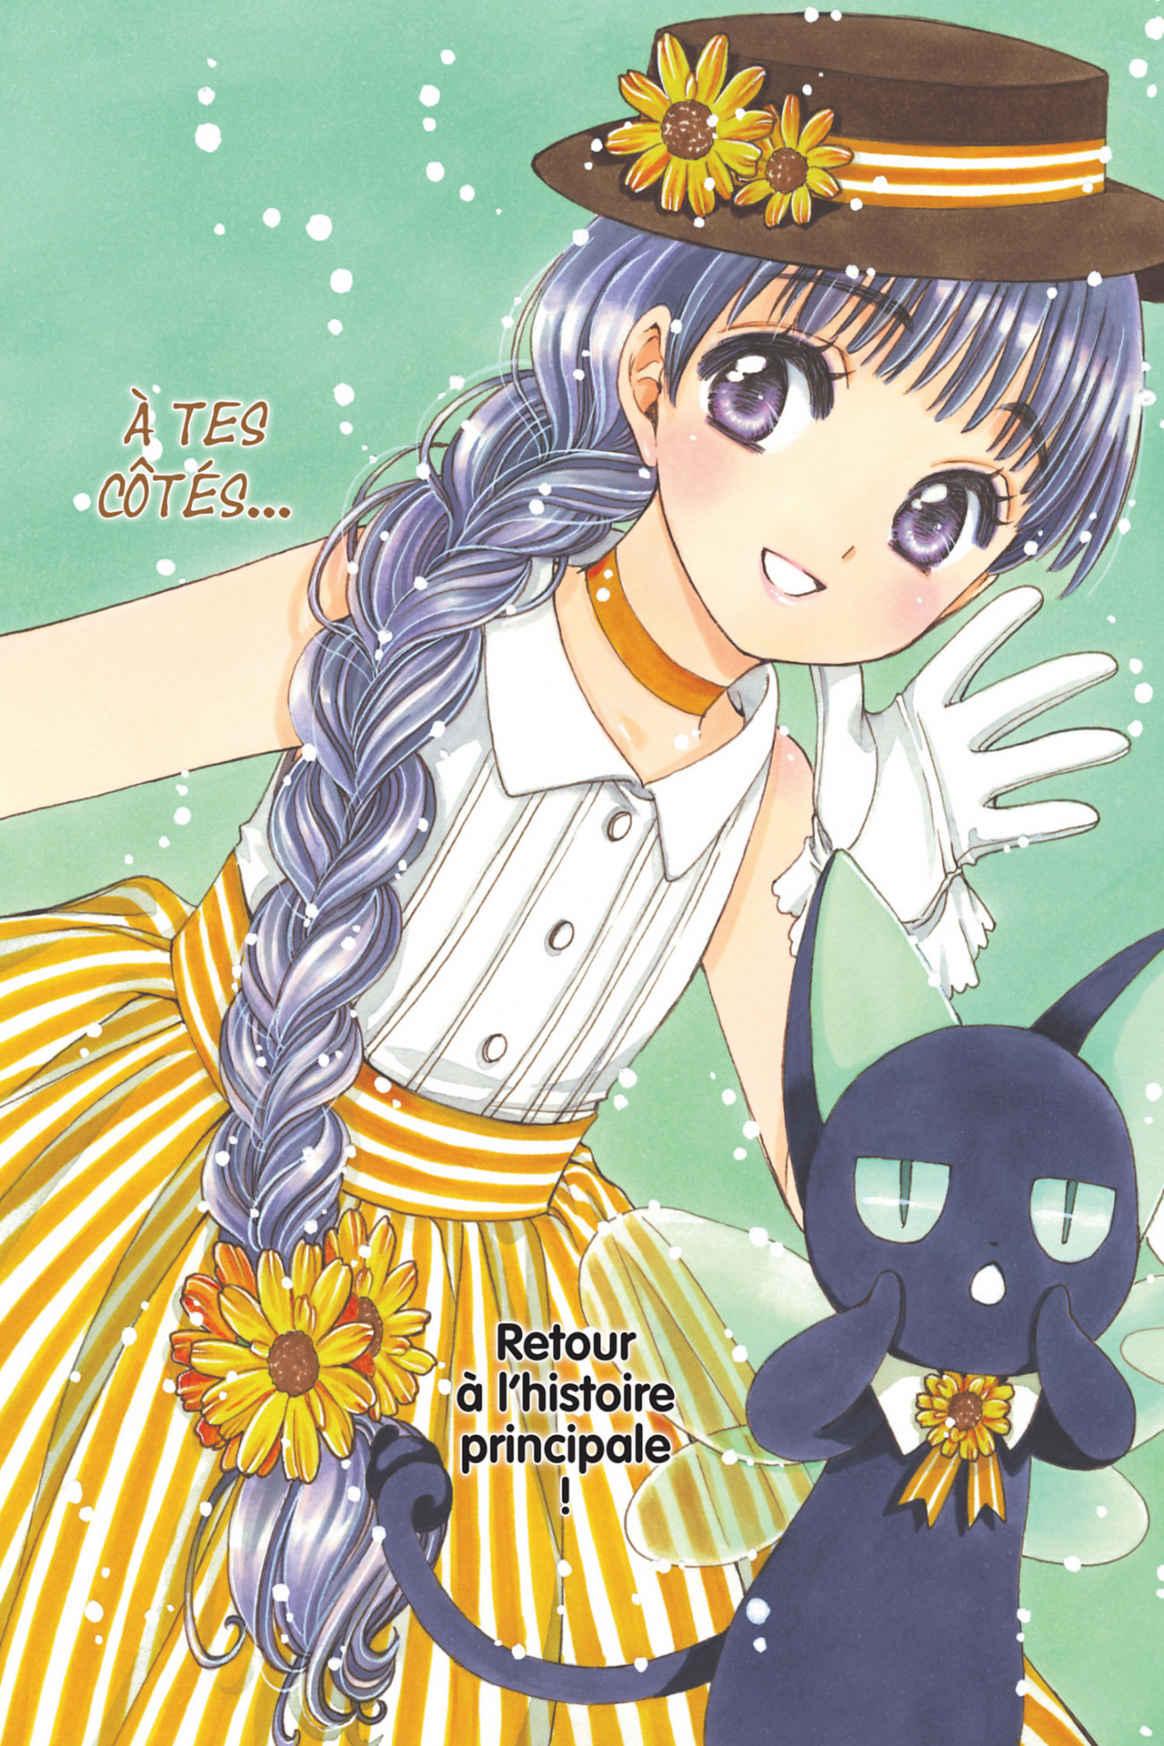 Card Captor Sakura et autres mangas [CLAMP] - Page 39 Cardca19